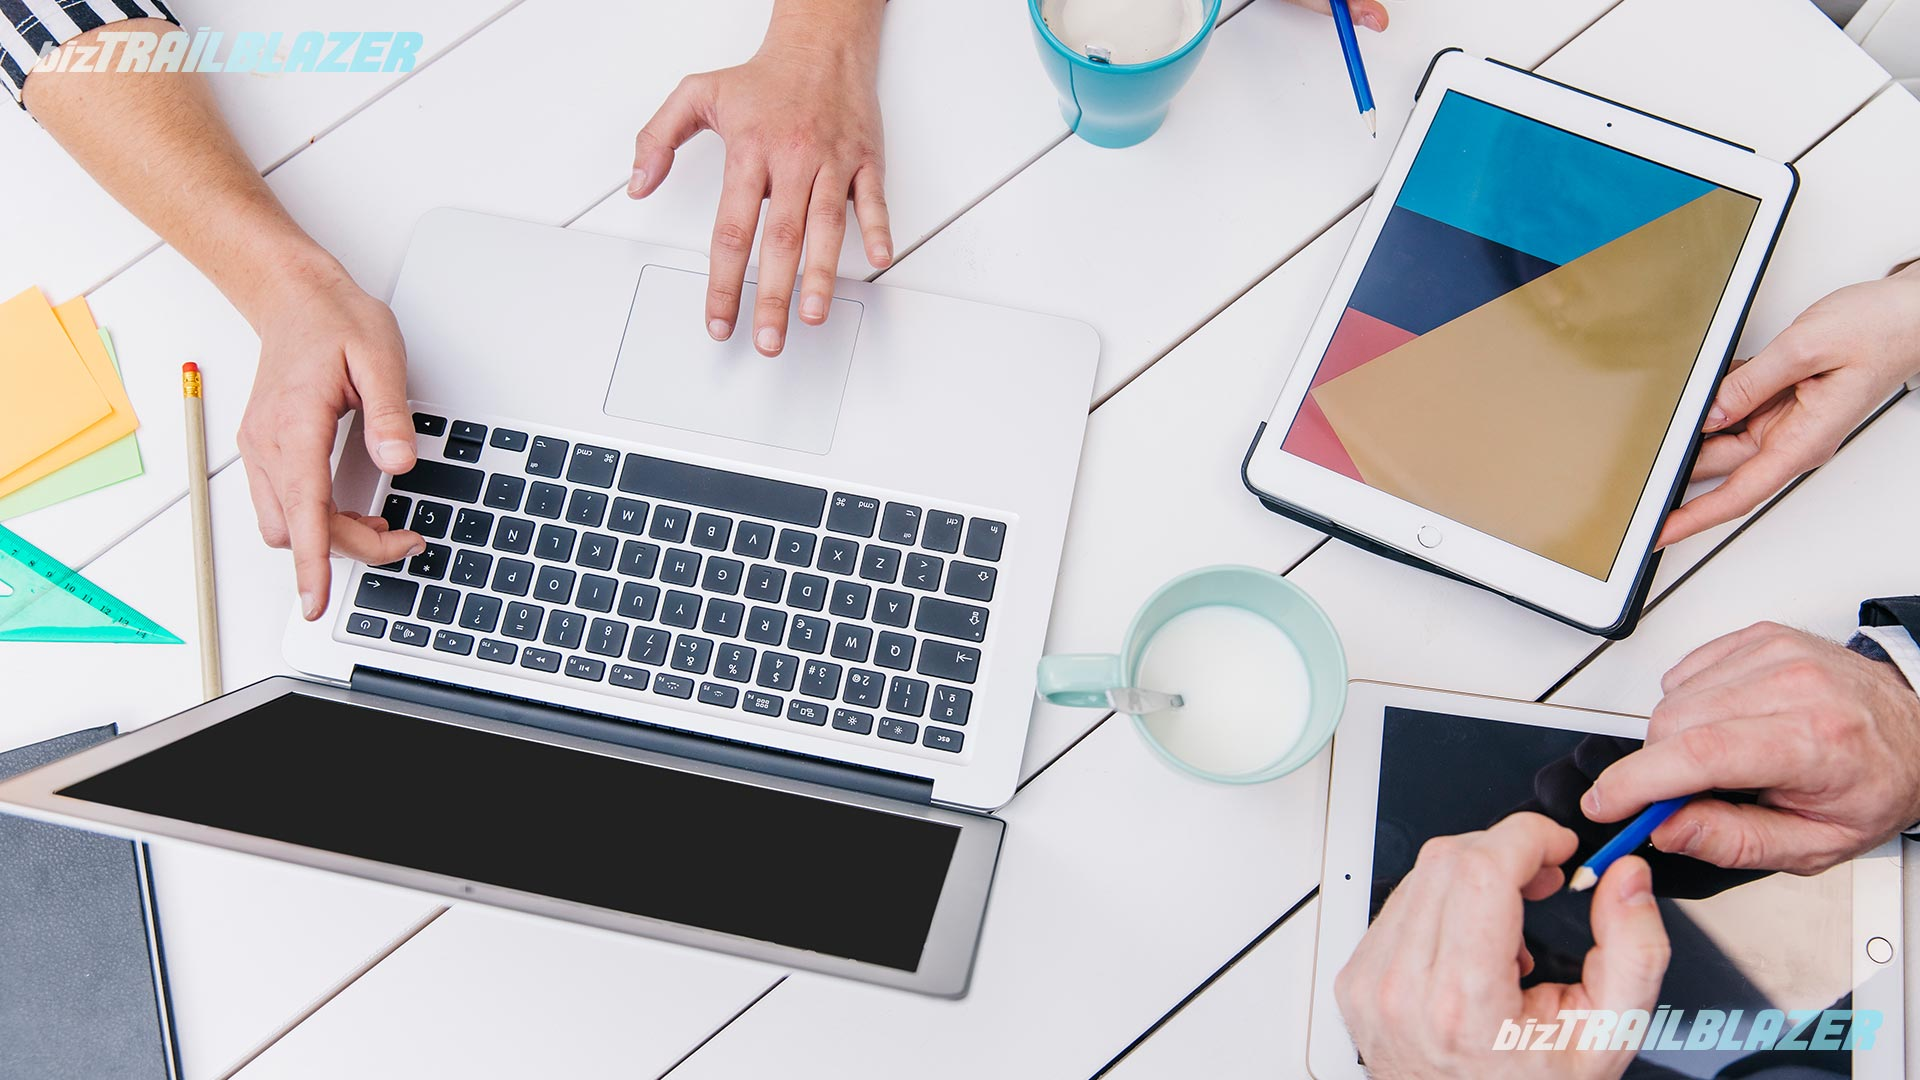 BizTrailBlazer-Blog-Essential-Web-Design-Tips-to-Improve-Your-Business-in-2020